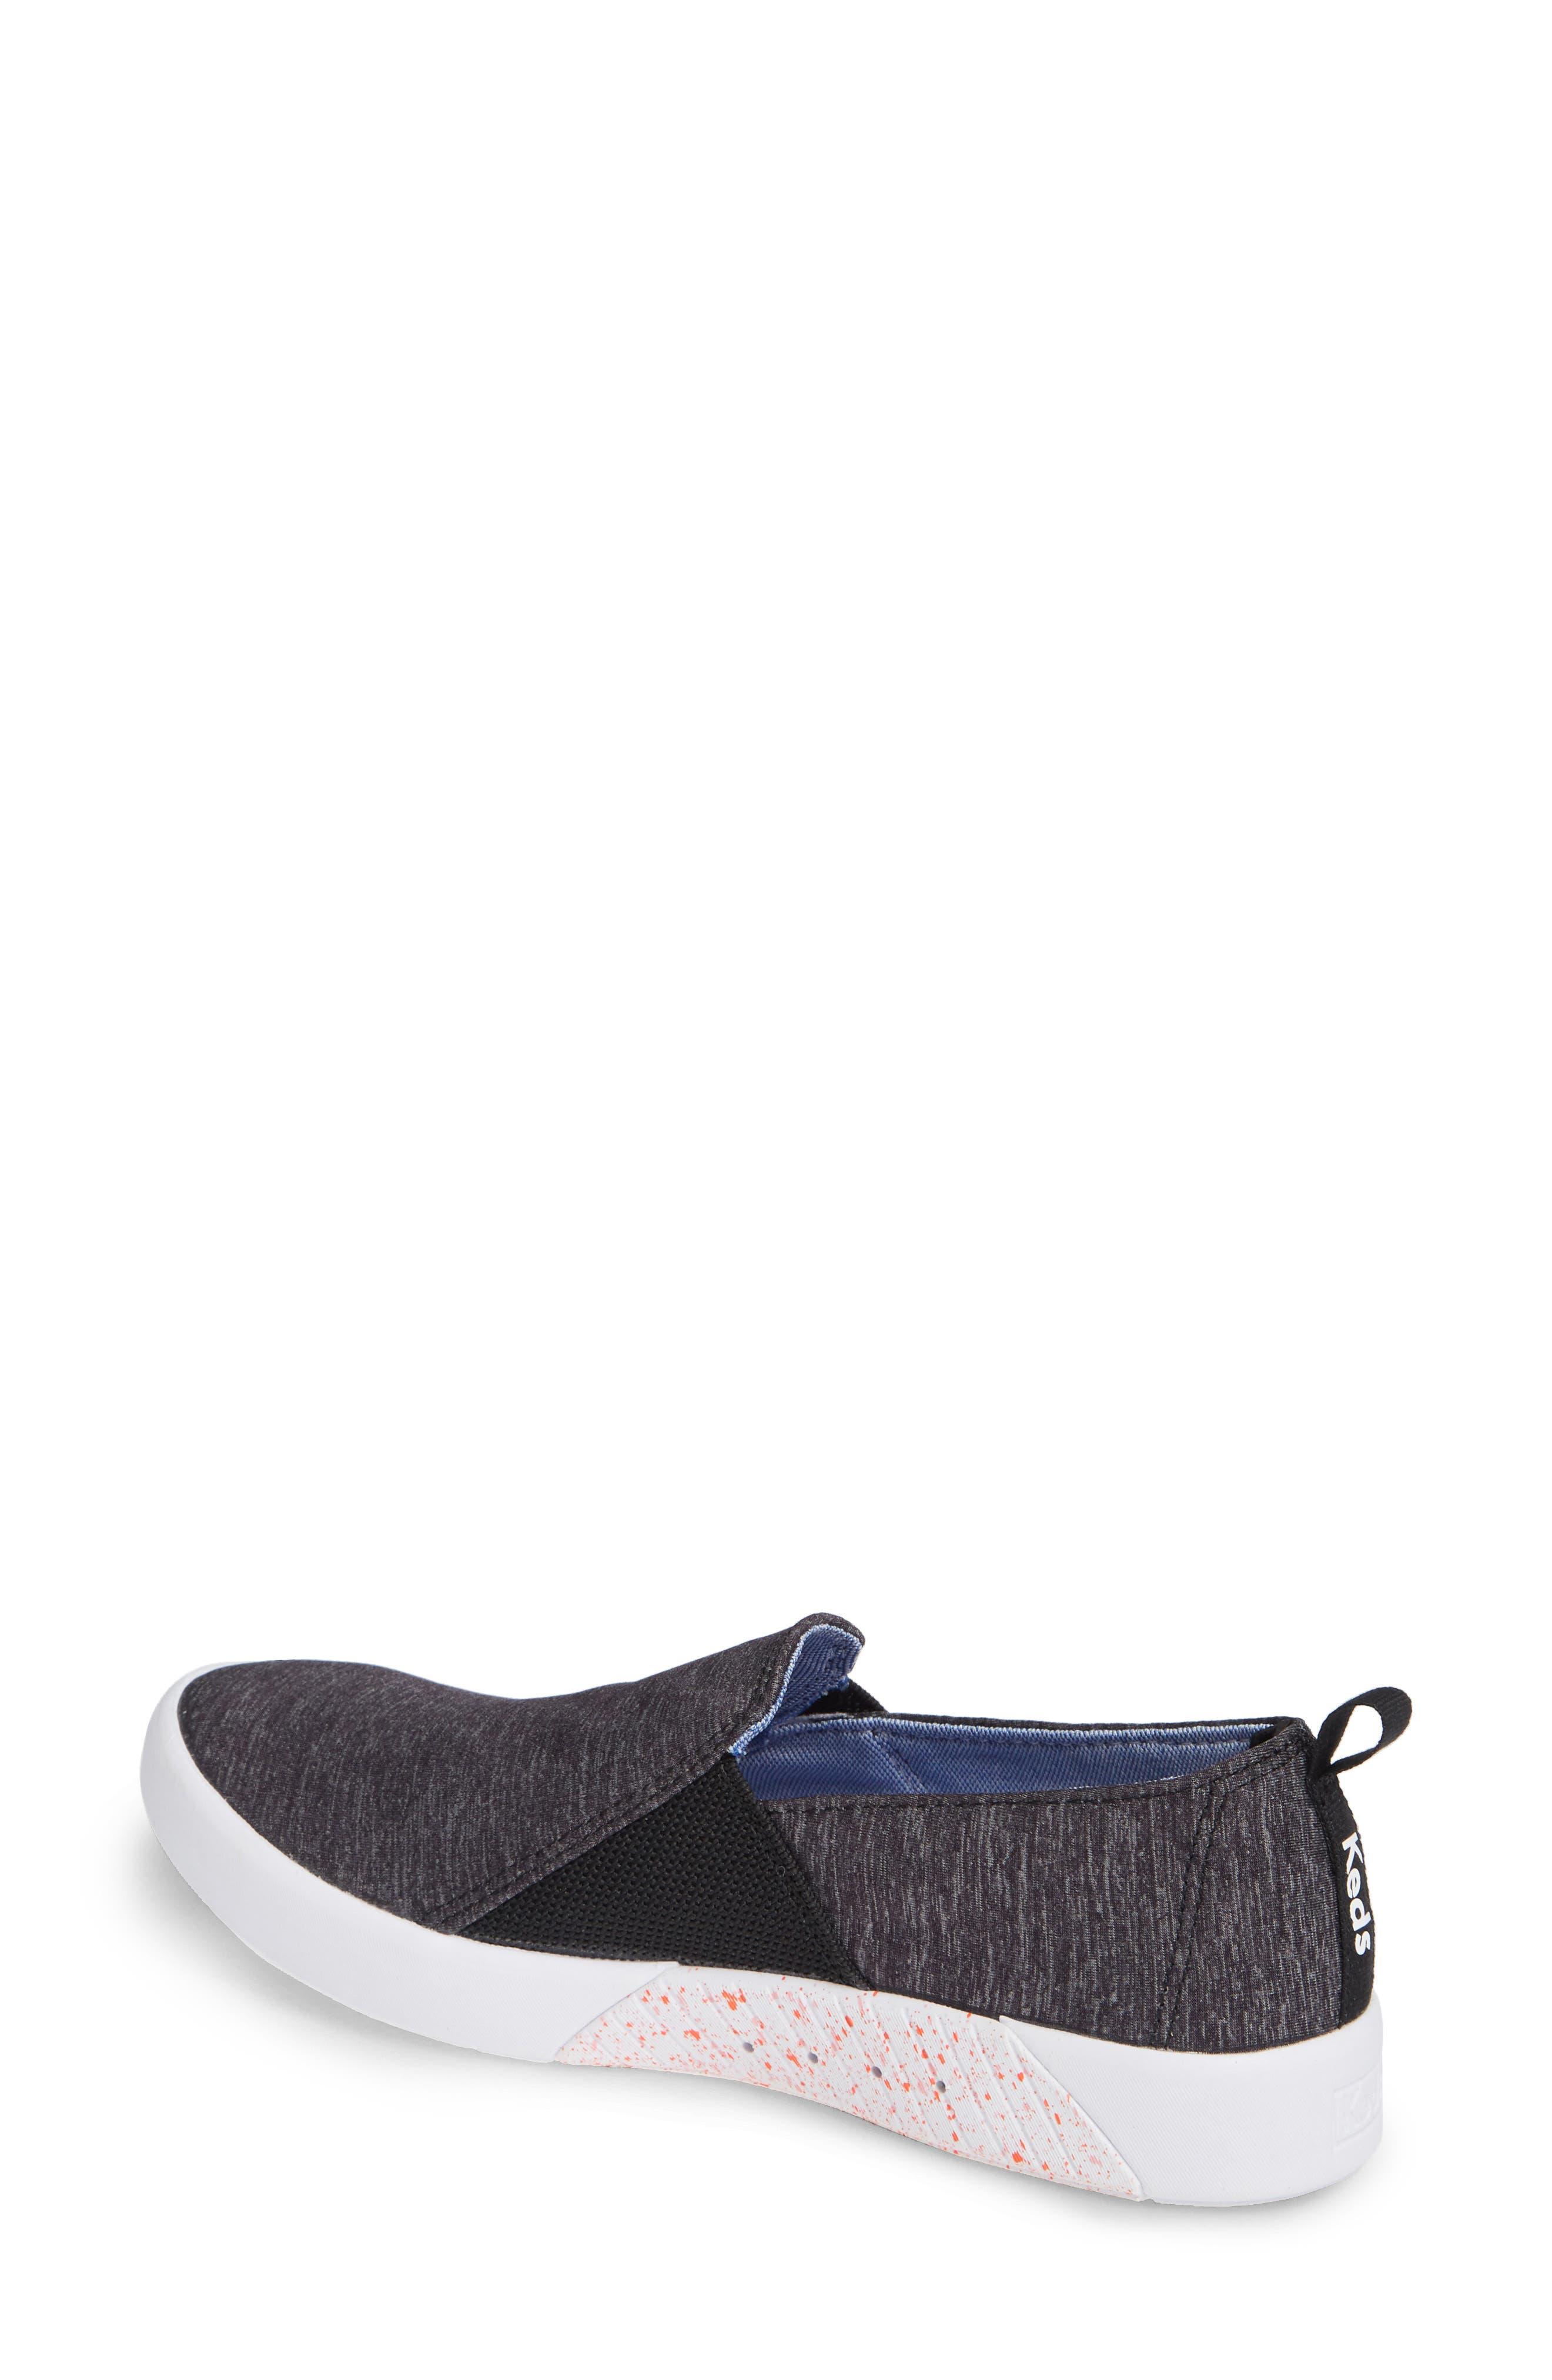 KEDS<SUP>®</SUP>, Studio Liv Active Knit Sneaker, Alternate thumbnail 2, color, BLACK